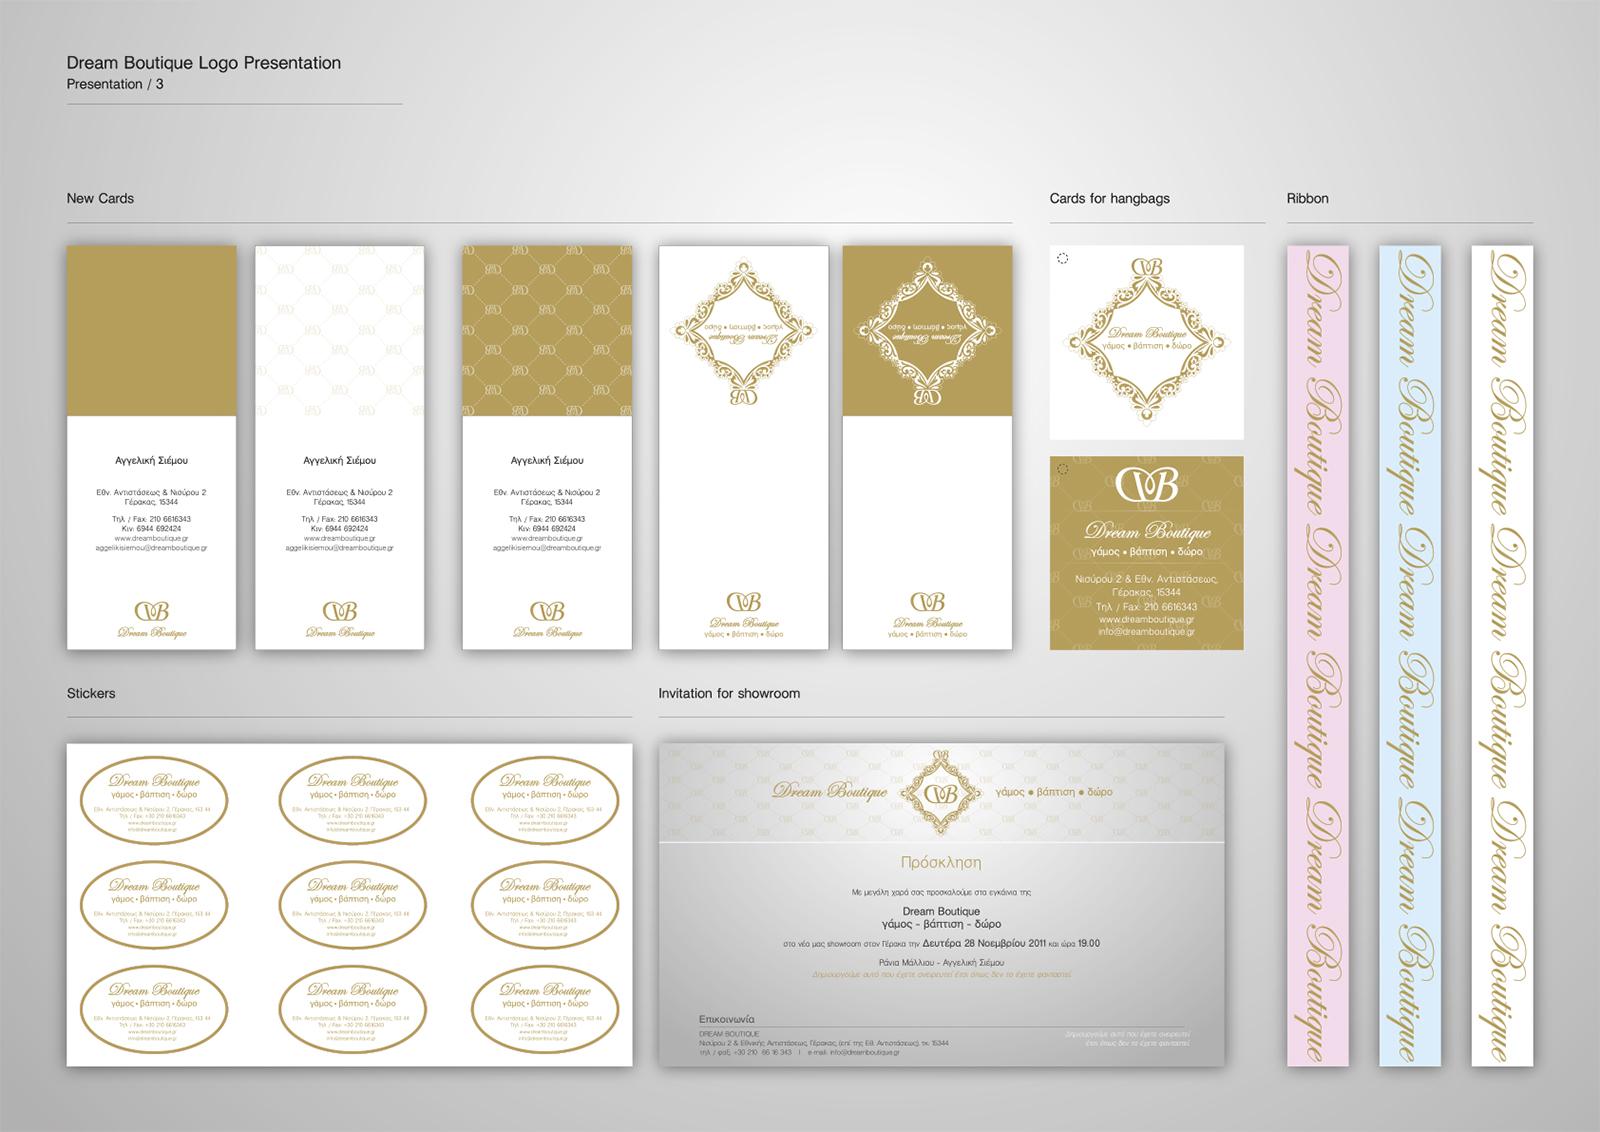 Corporate Identity Dream Boutique_Logo Presentation_3_Yianart